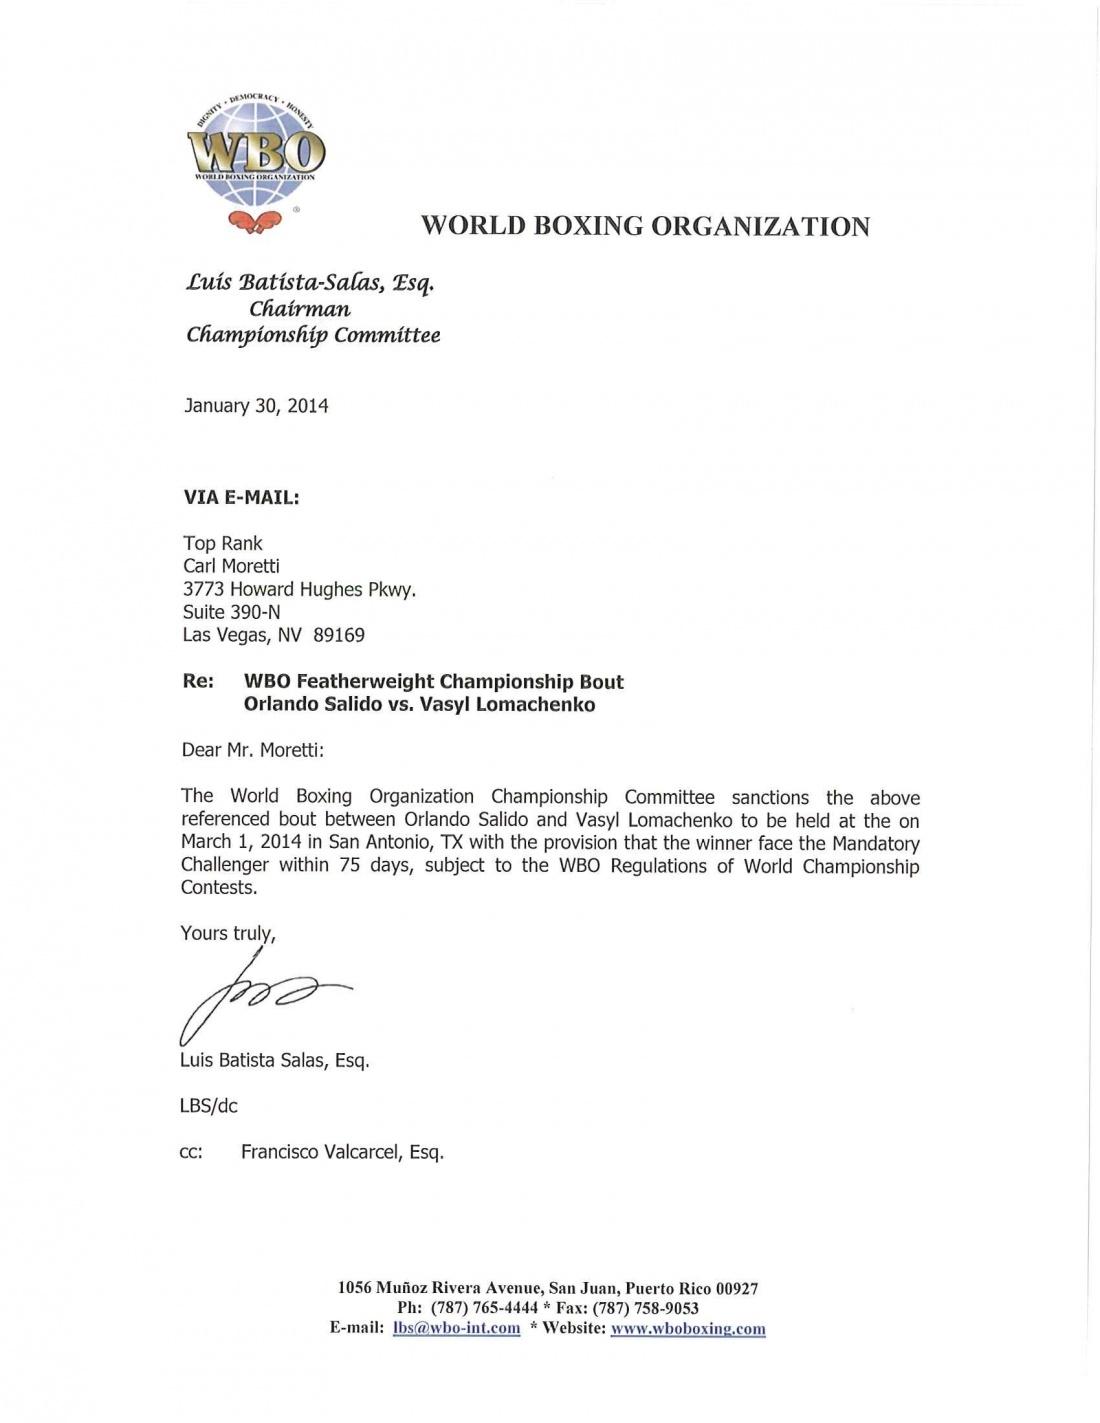 Salido vs. Lomachenko sanction letter